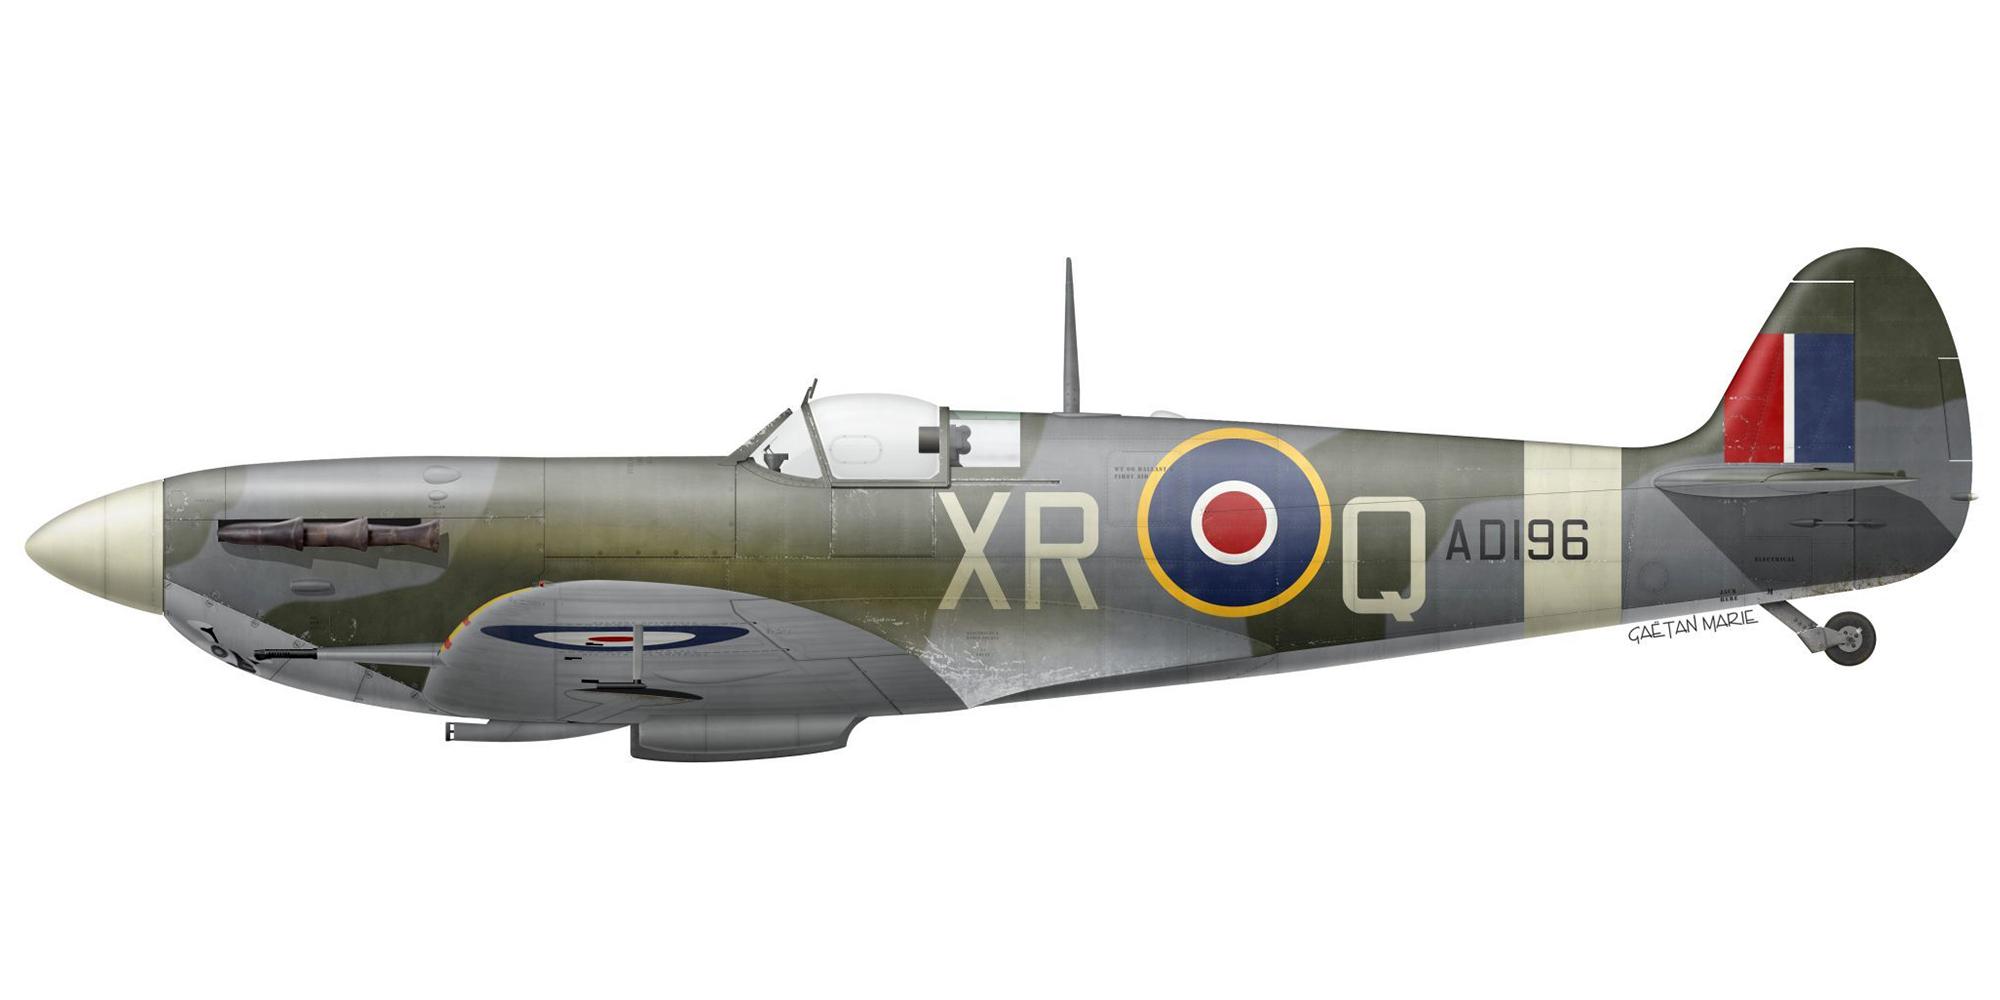 Spitfire MkVb RAF 71Sqn XRQ Frank Zavakos AD196 North Weald 1941 0A